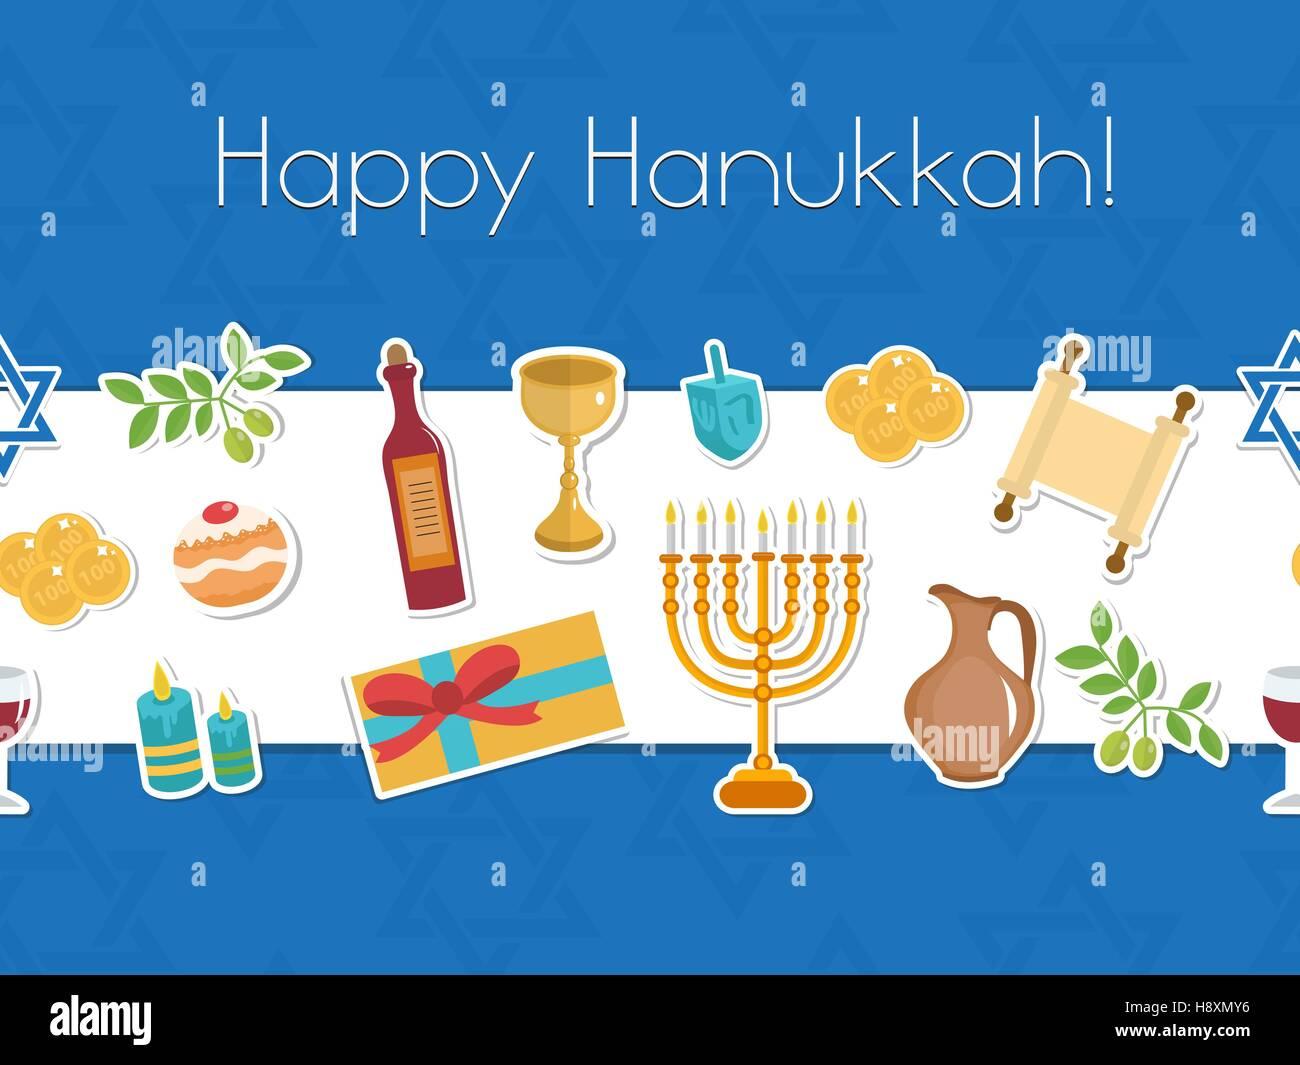 Happy hanukkah seamless poster greeting card flyer invitation happy hanukkah seamless poster greeting card flyer invitation m4hsunfo